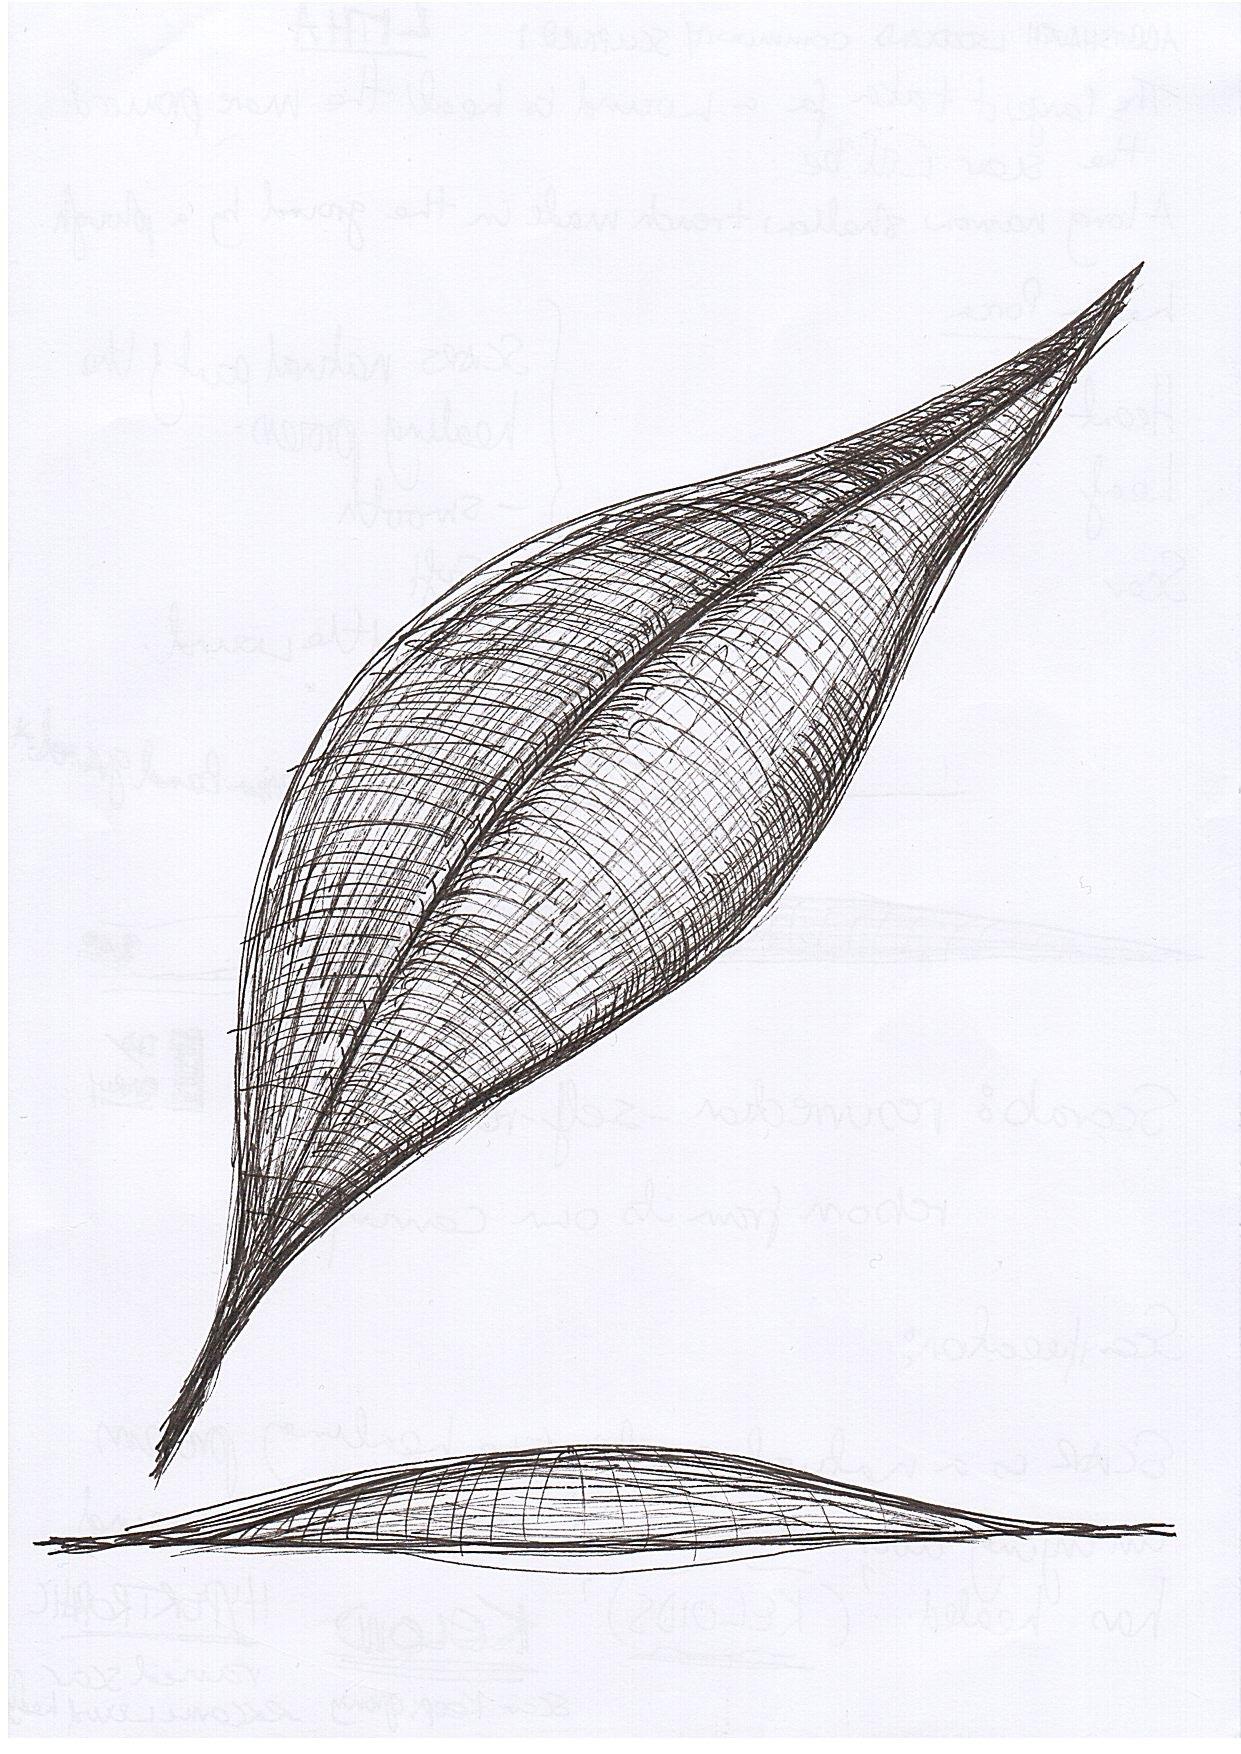 1462698587743 LK sketch 2.jpg